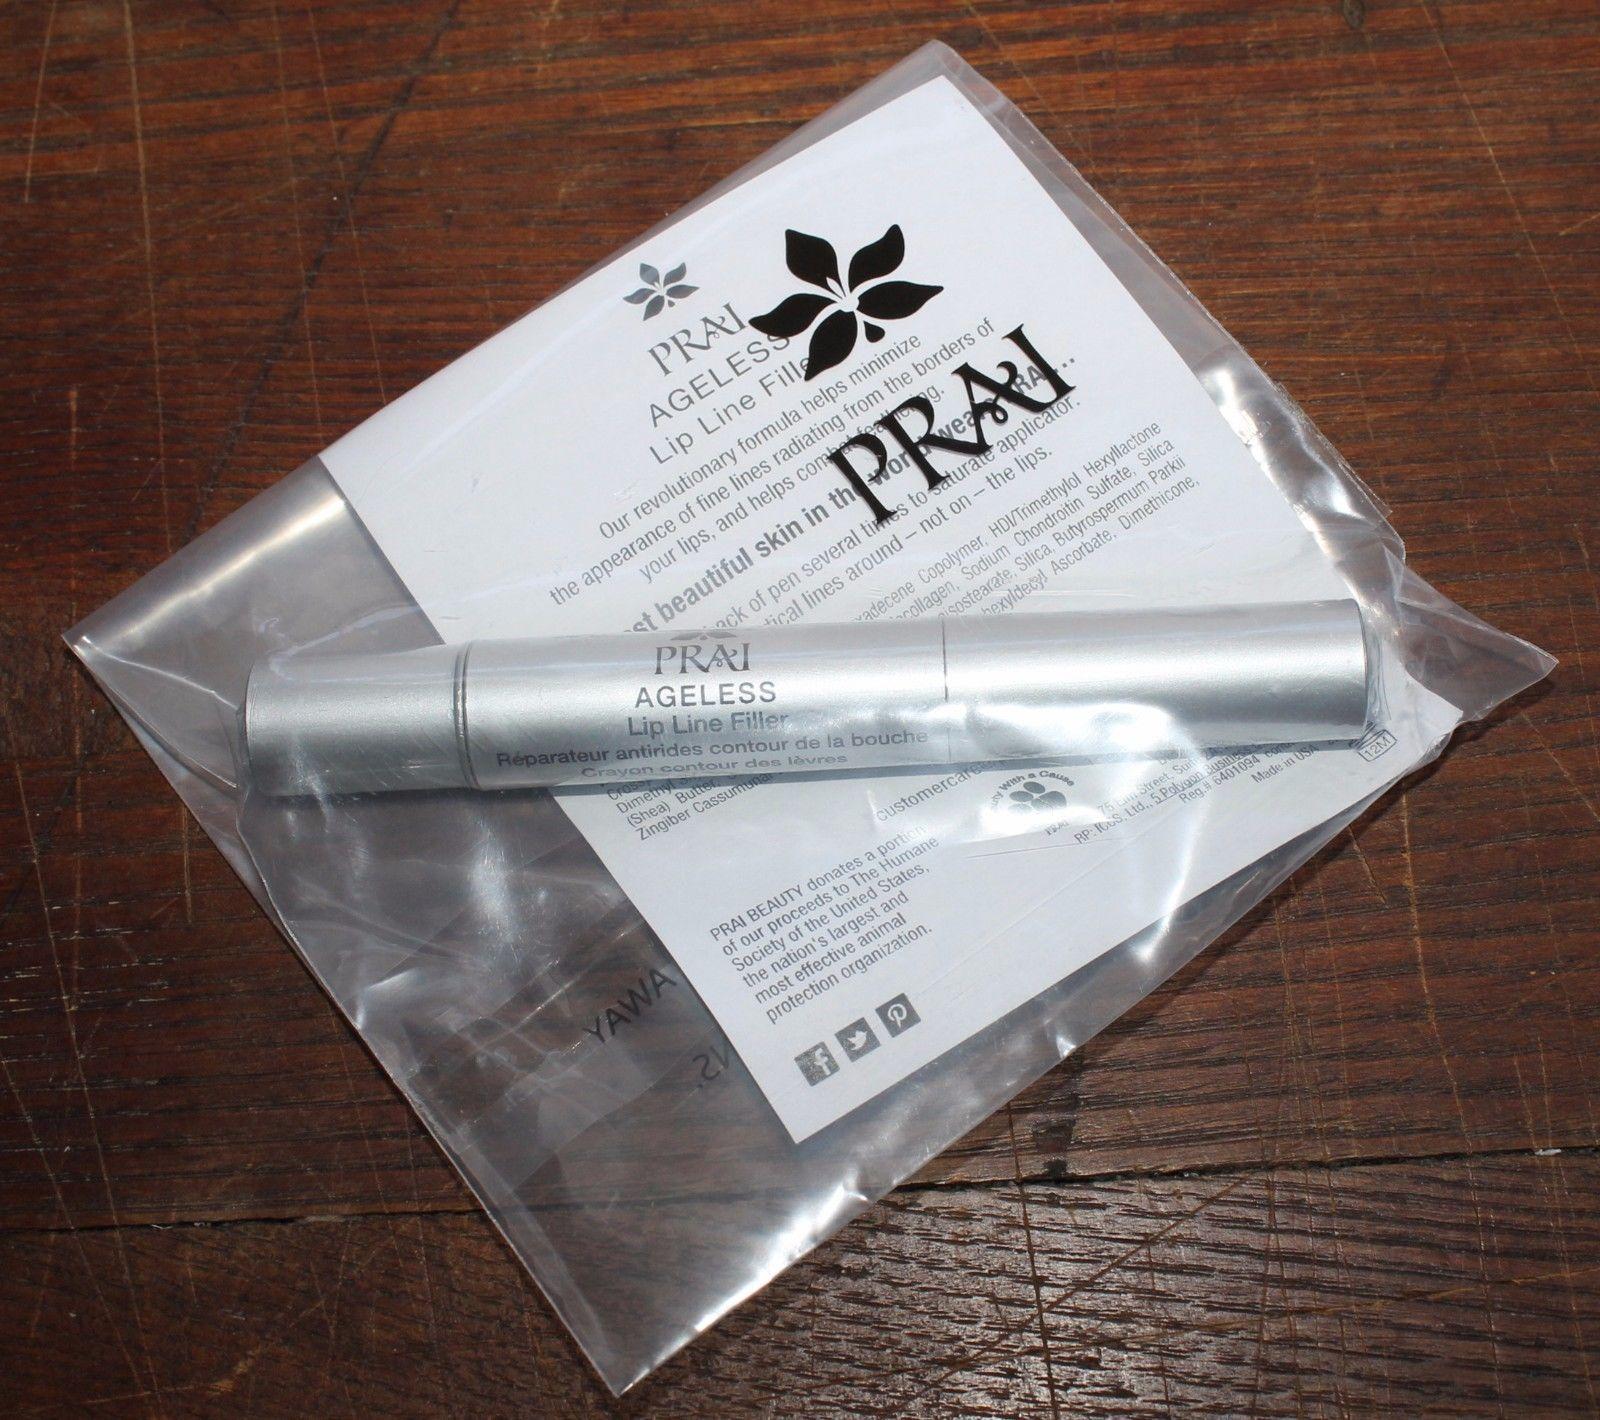 PRAI Ageless Lip Line Filler .13 Oz. / 4ml SUPERSI